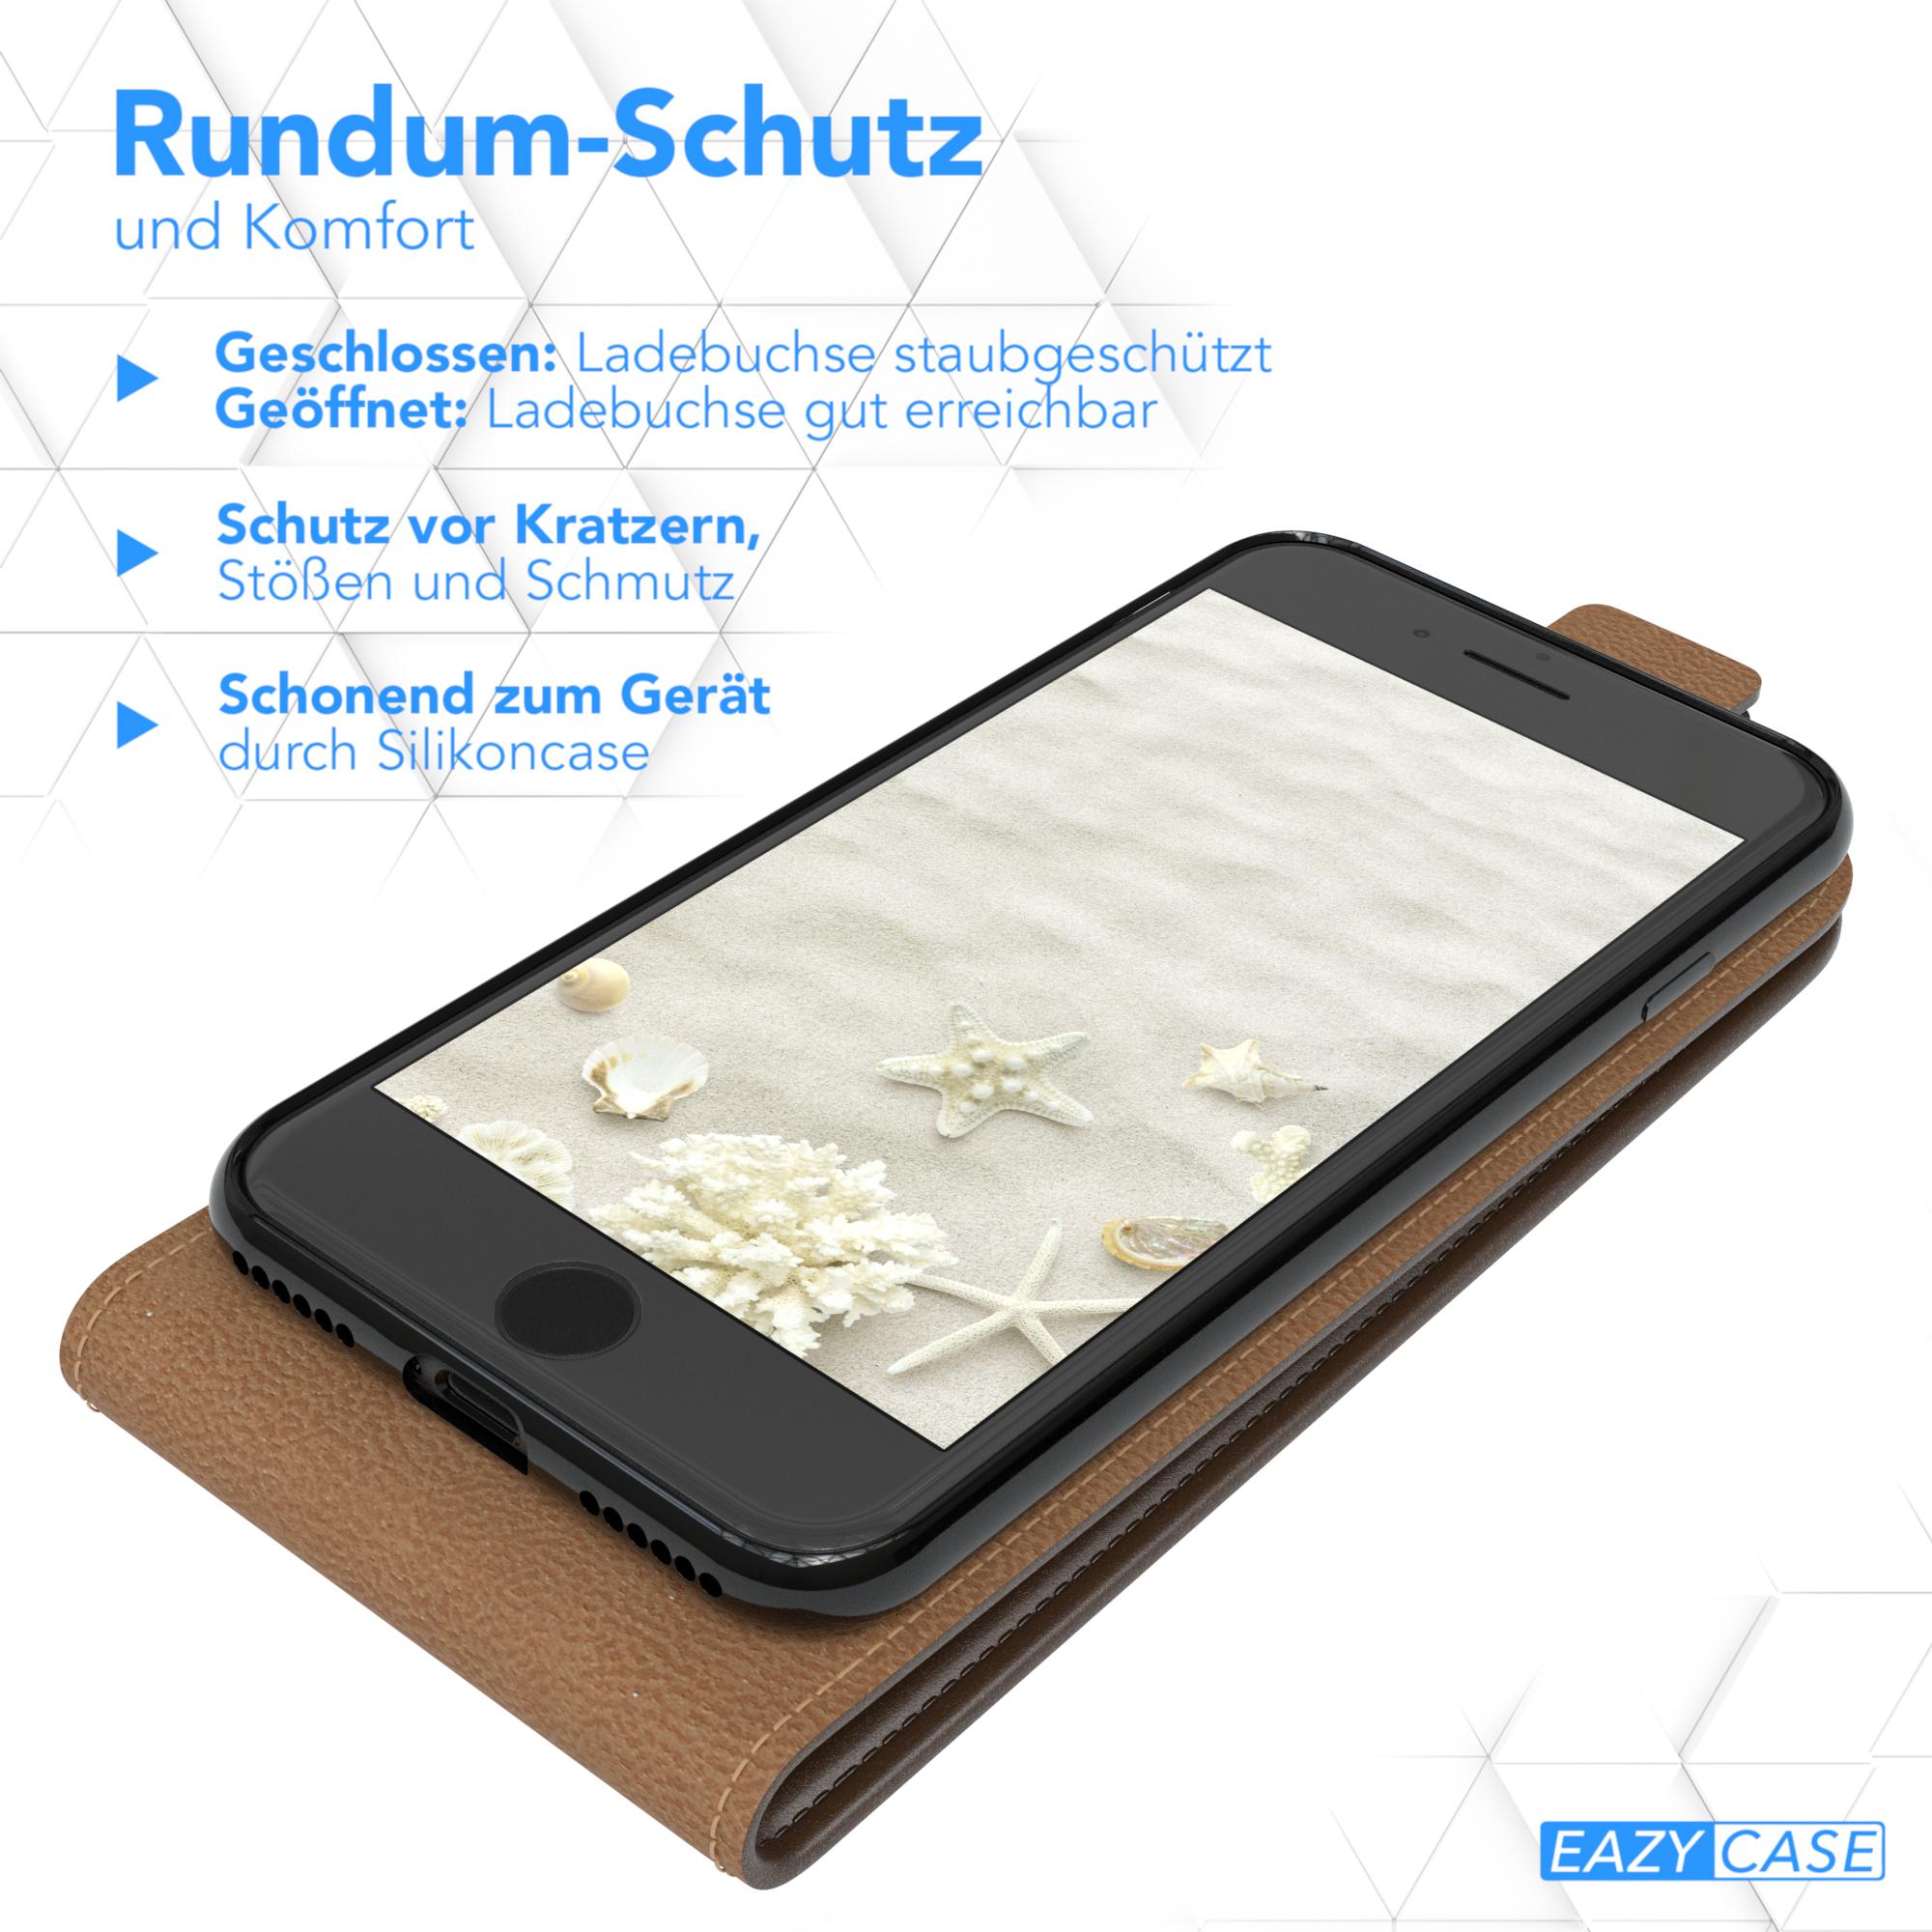 Handy-Tasche-fuer-Apple-iPhone-Flip-Case-Cover-Schutz-Huelle-Klapp-Etui-Bumper